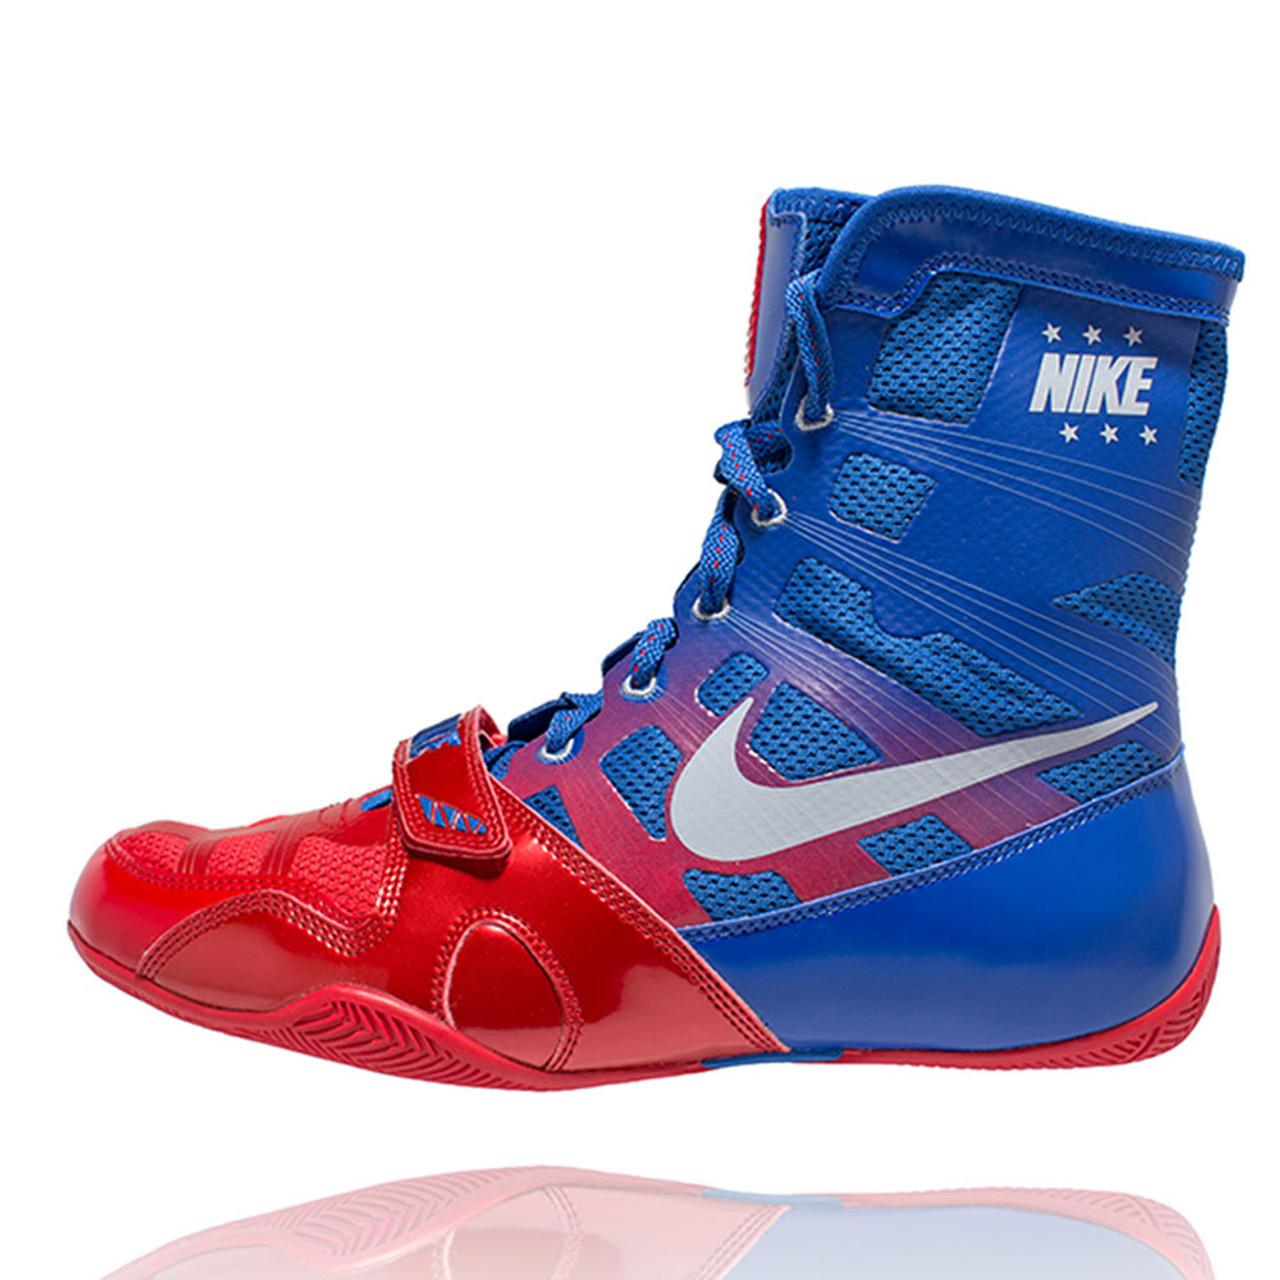 Nike HyperKO (Multiple Colors)